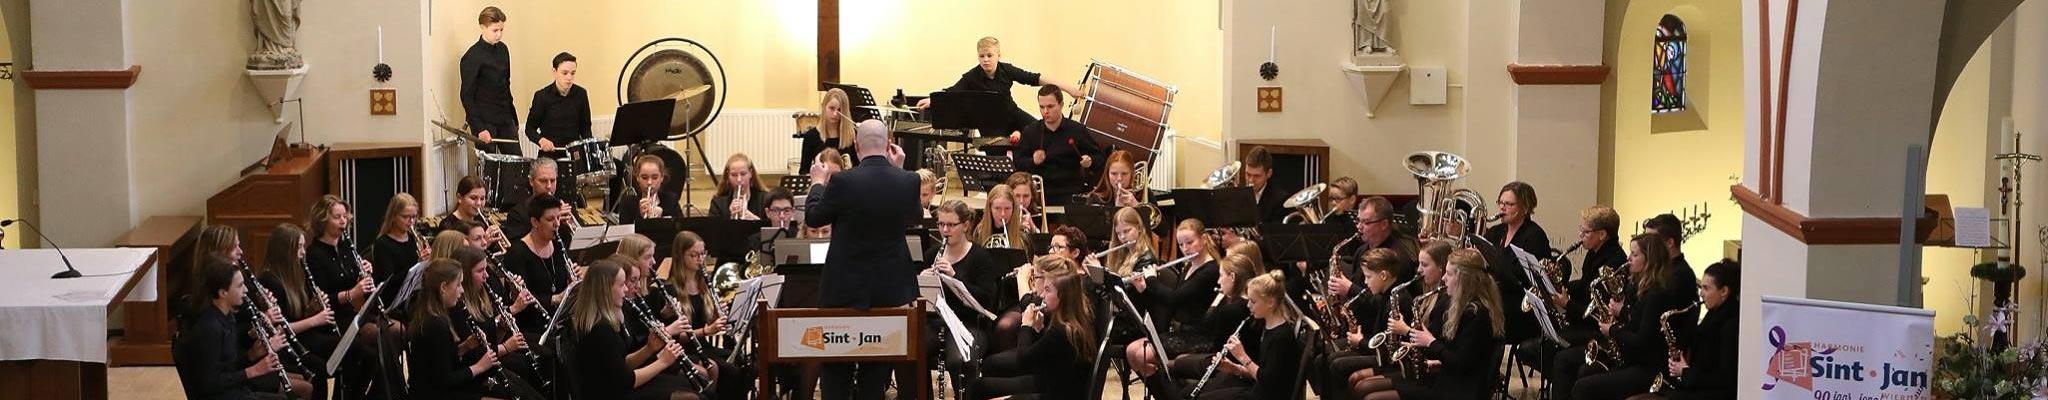 nieuwjaarsconcert-2018-b-orkest-harmonie-sint-jan-wierden